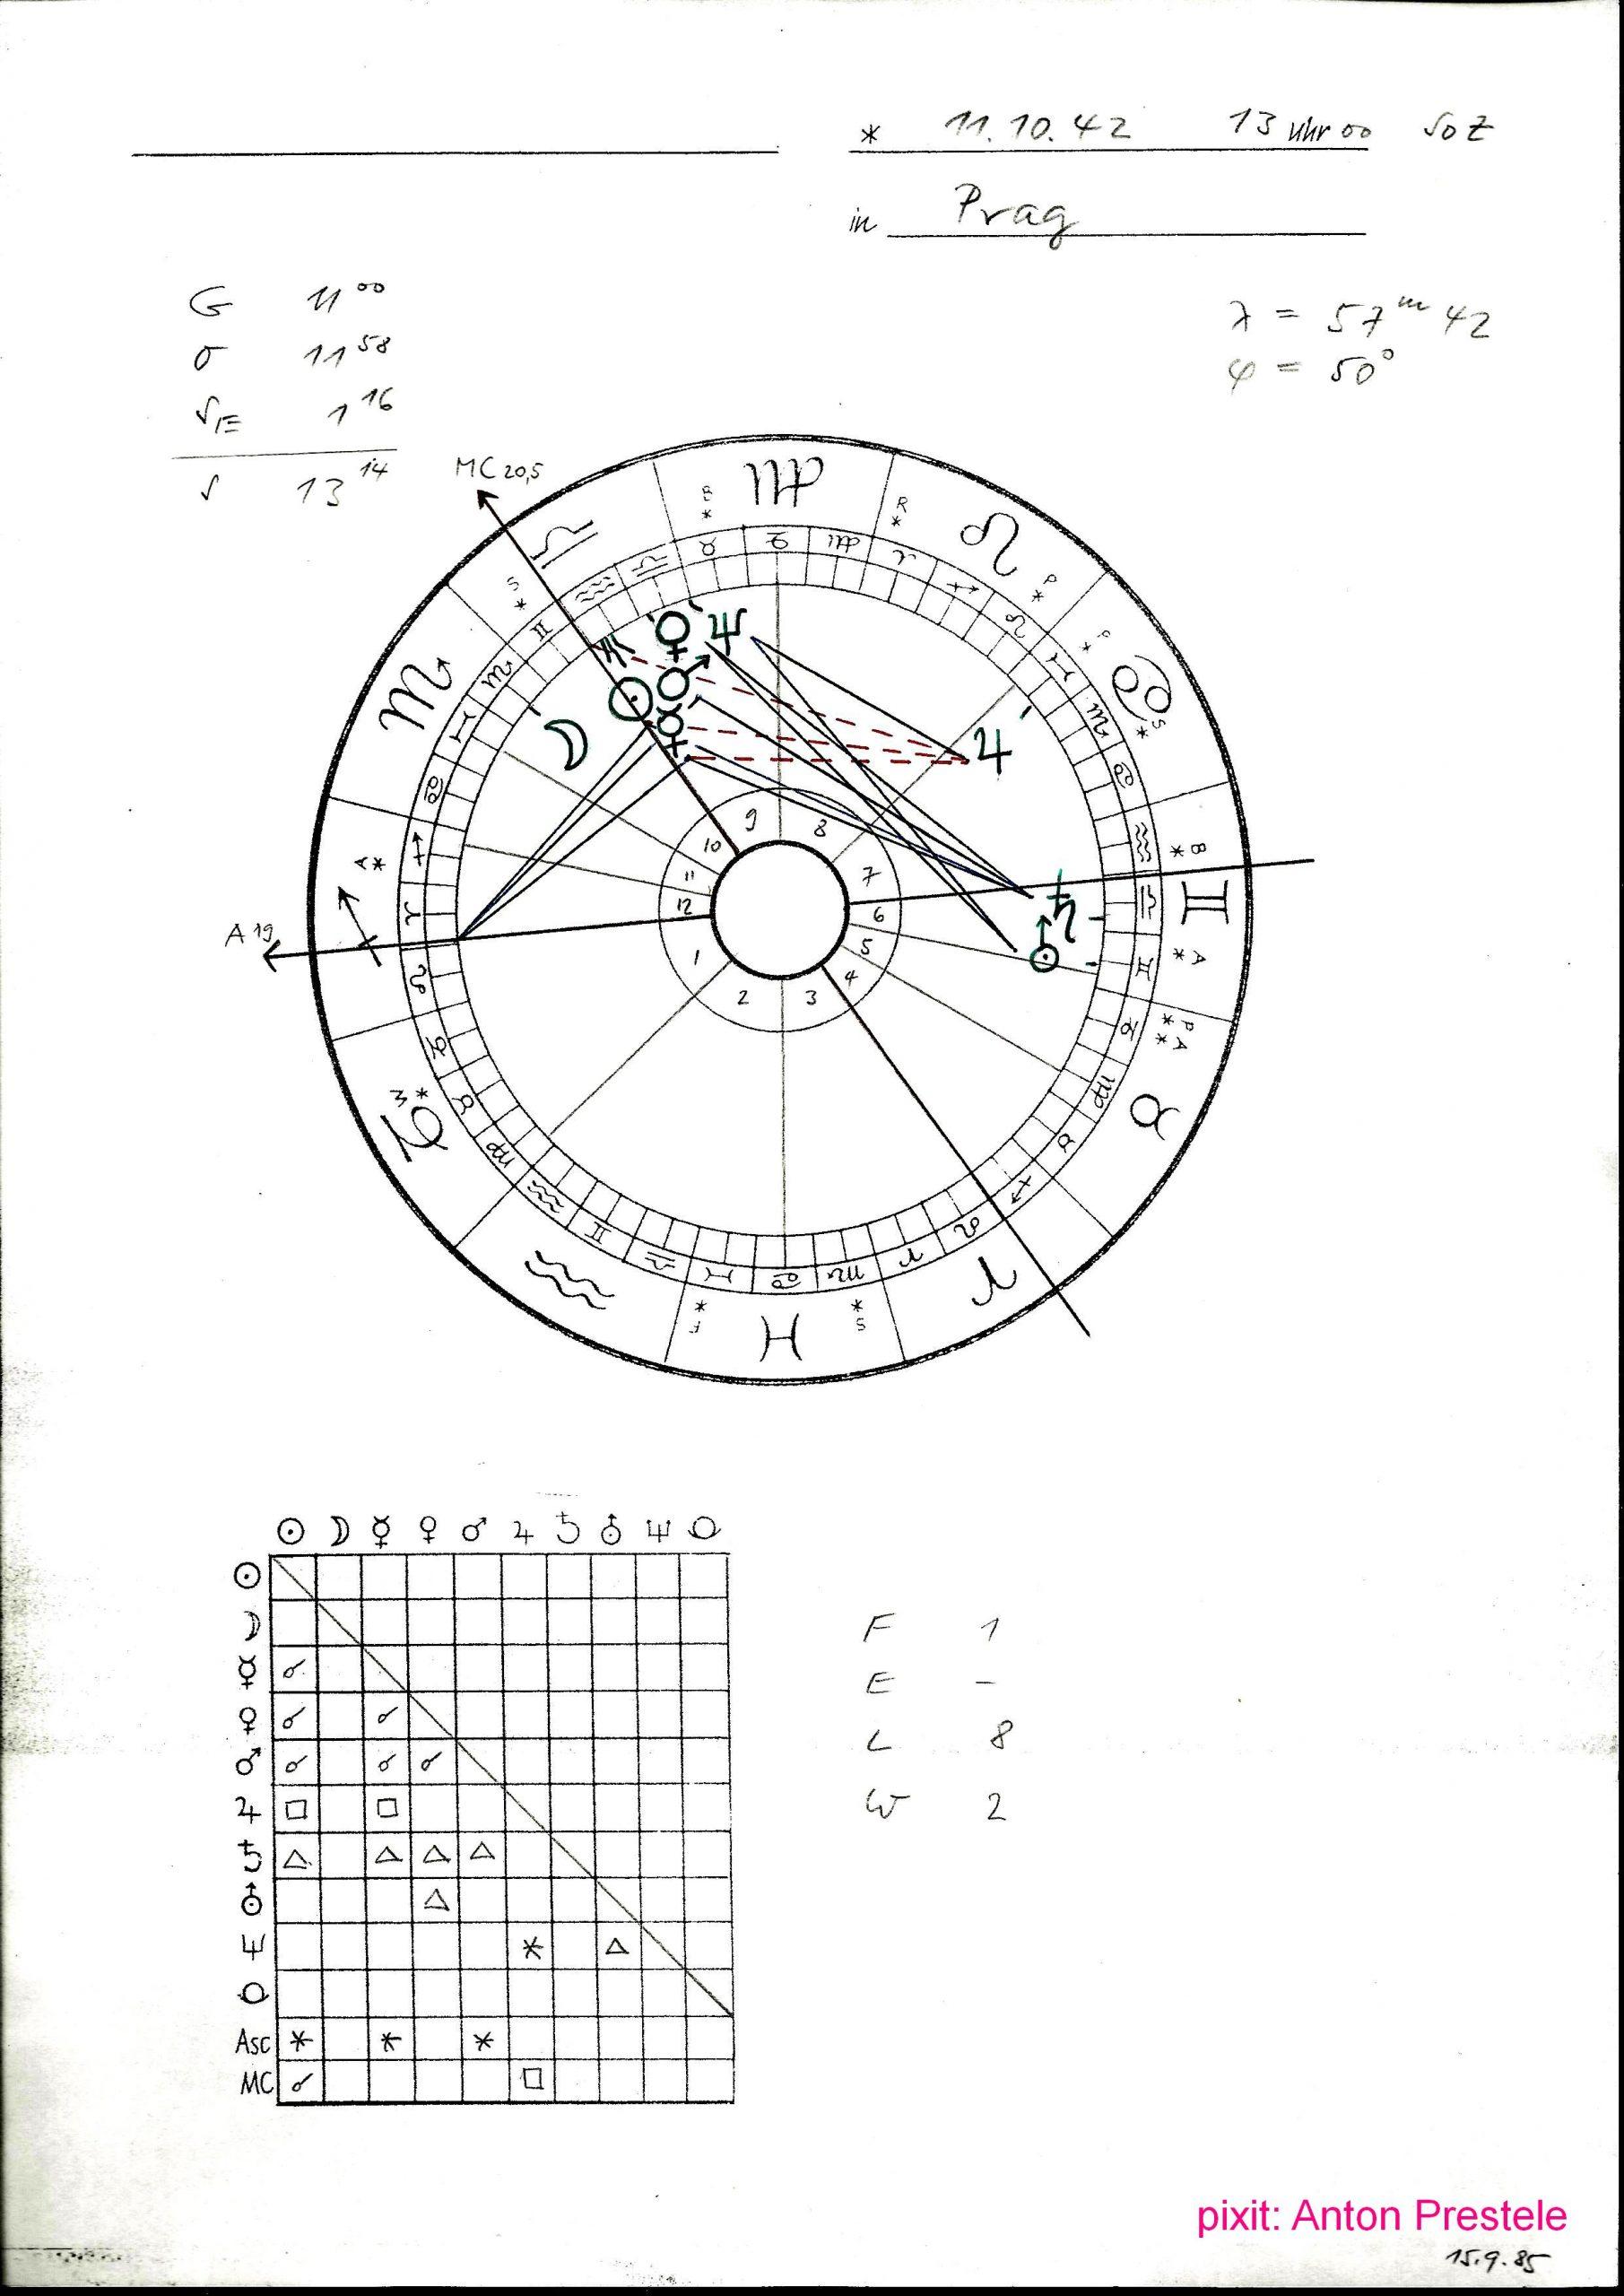 Astrogramm WeHo - Autor: Anton Prestele